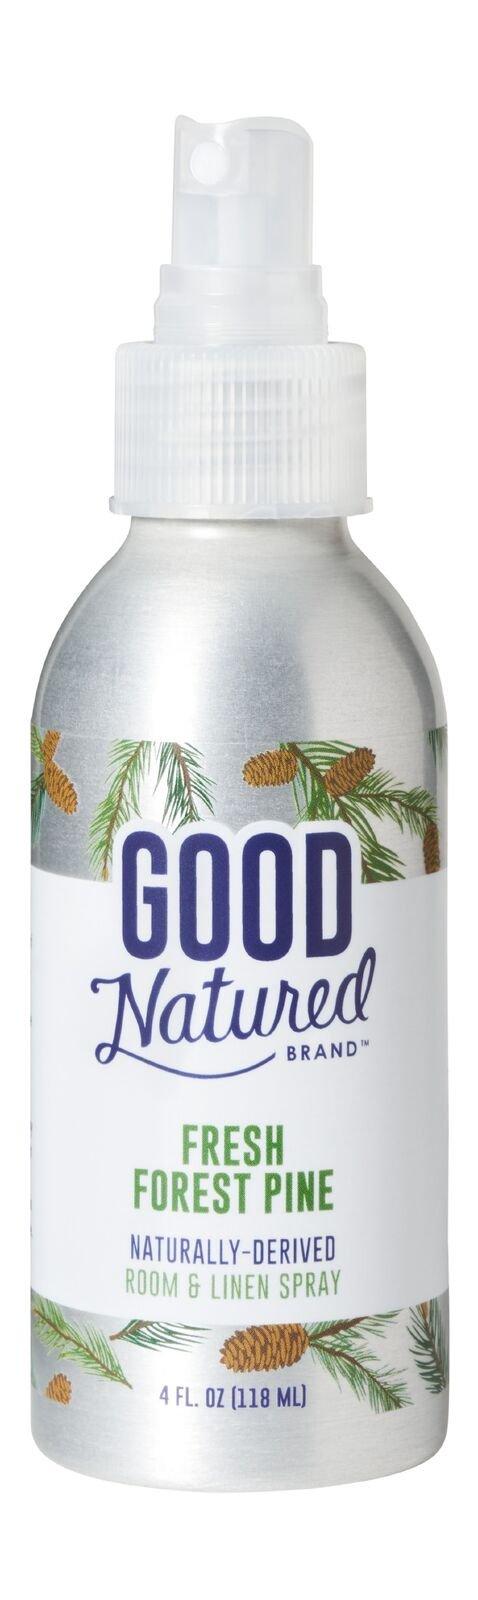 Good Natured Brand All-Natural Eco-Friendly Fresh Forest Pine Room & Linen Spray 4 fl. oz.